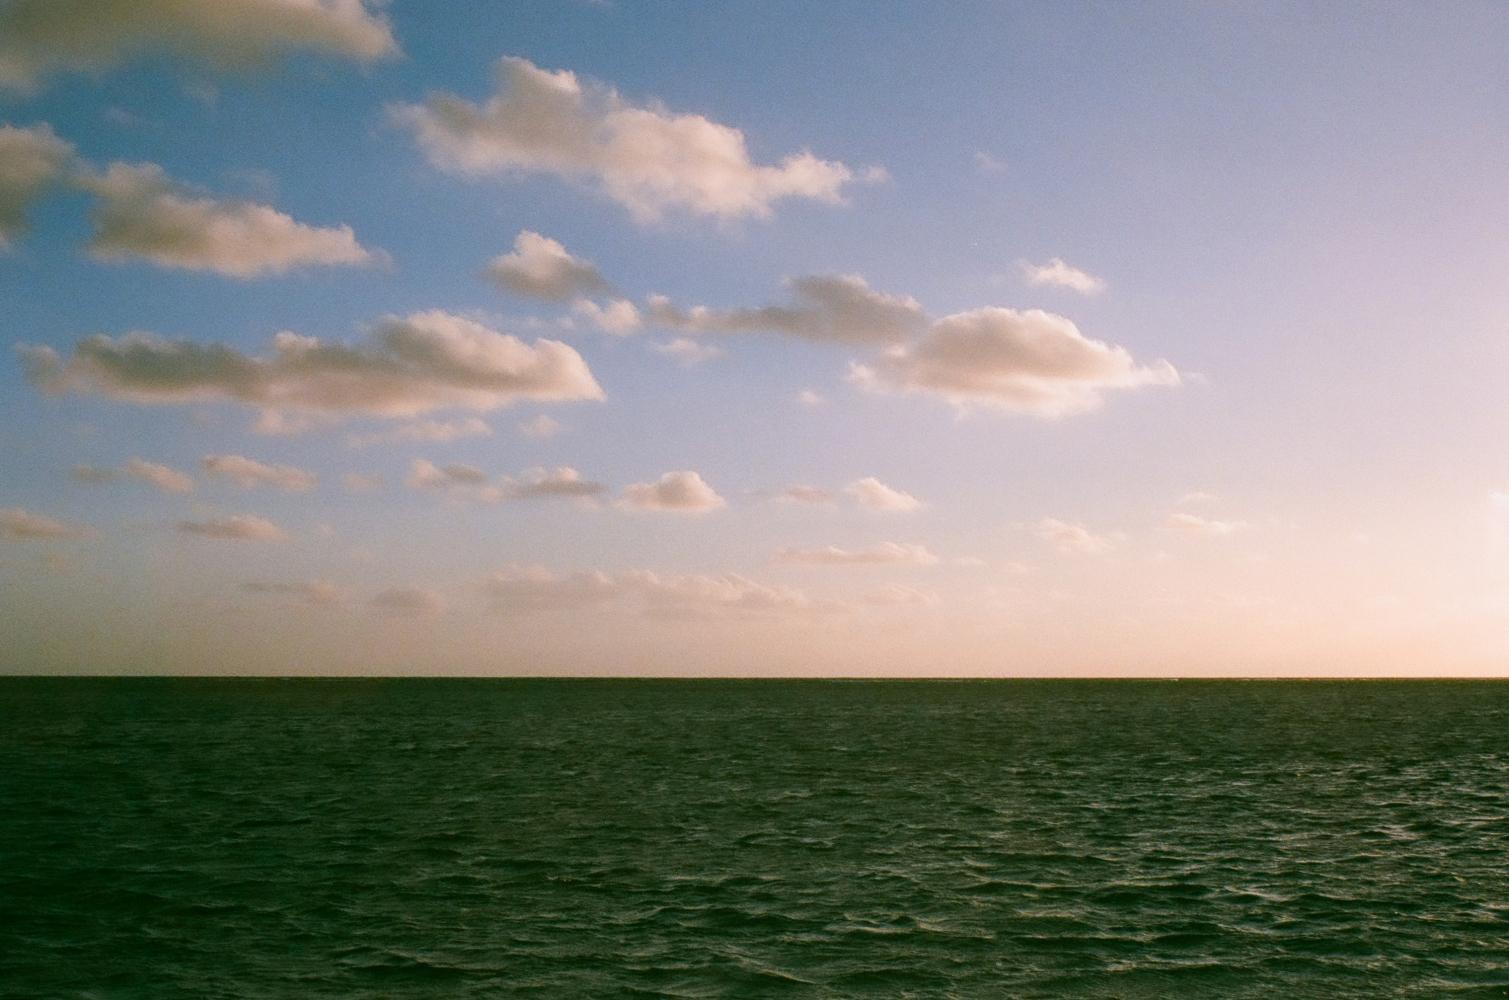 OAHU_DEC16_FILMFRAMES_37.JPG